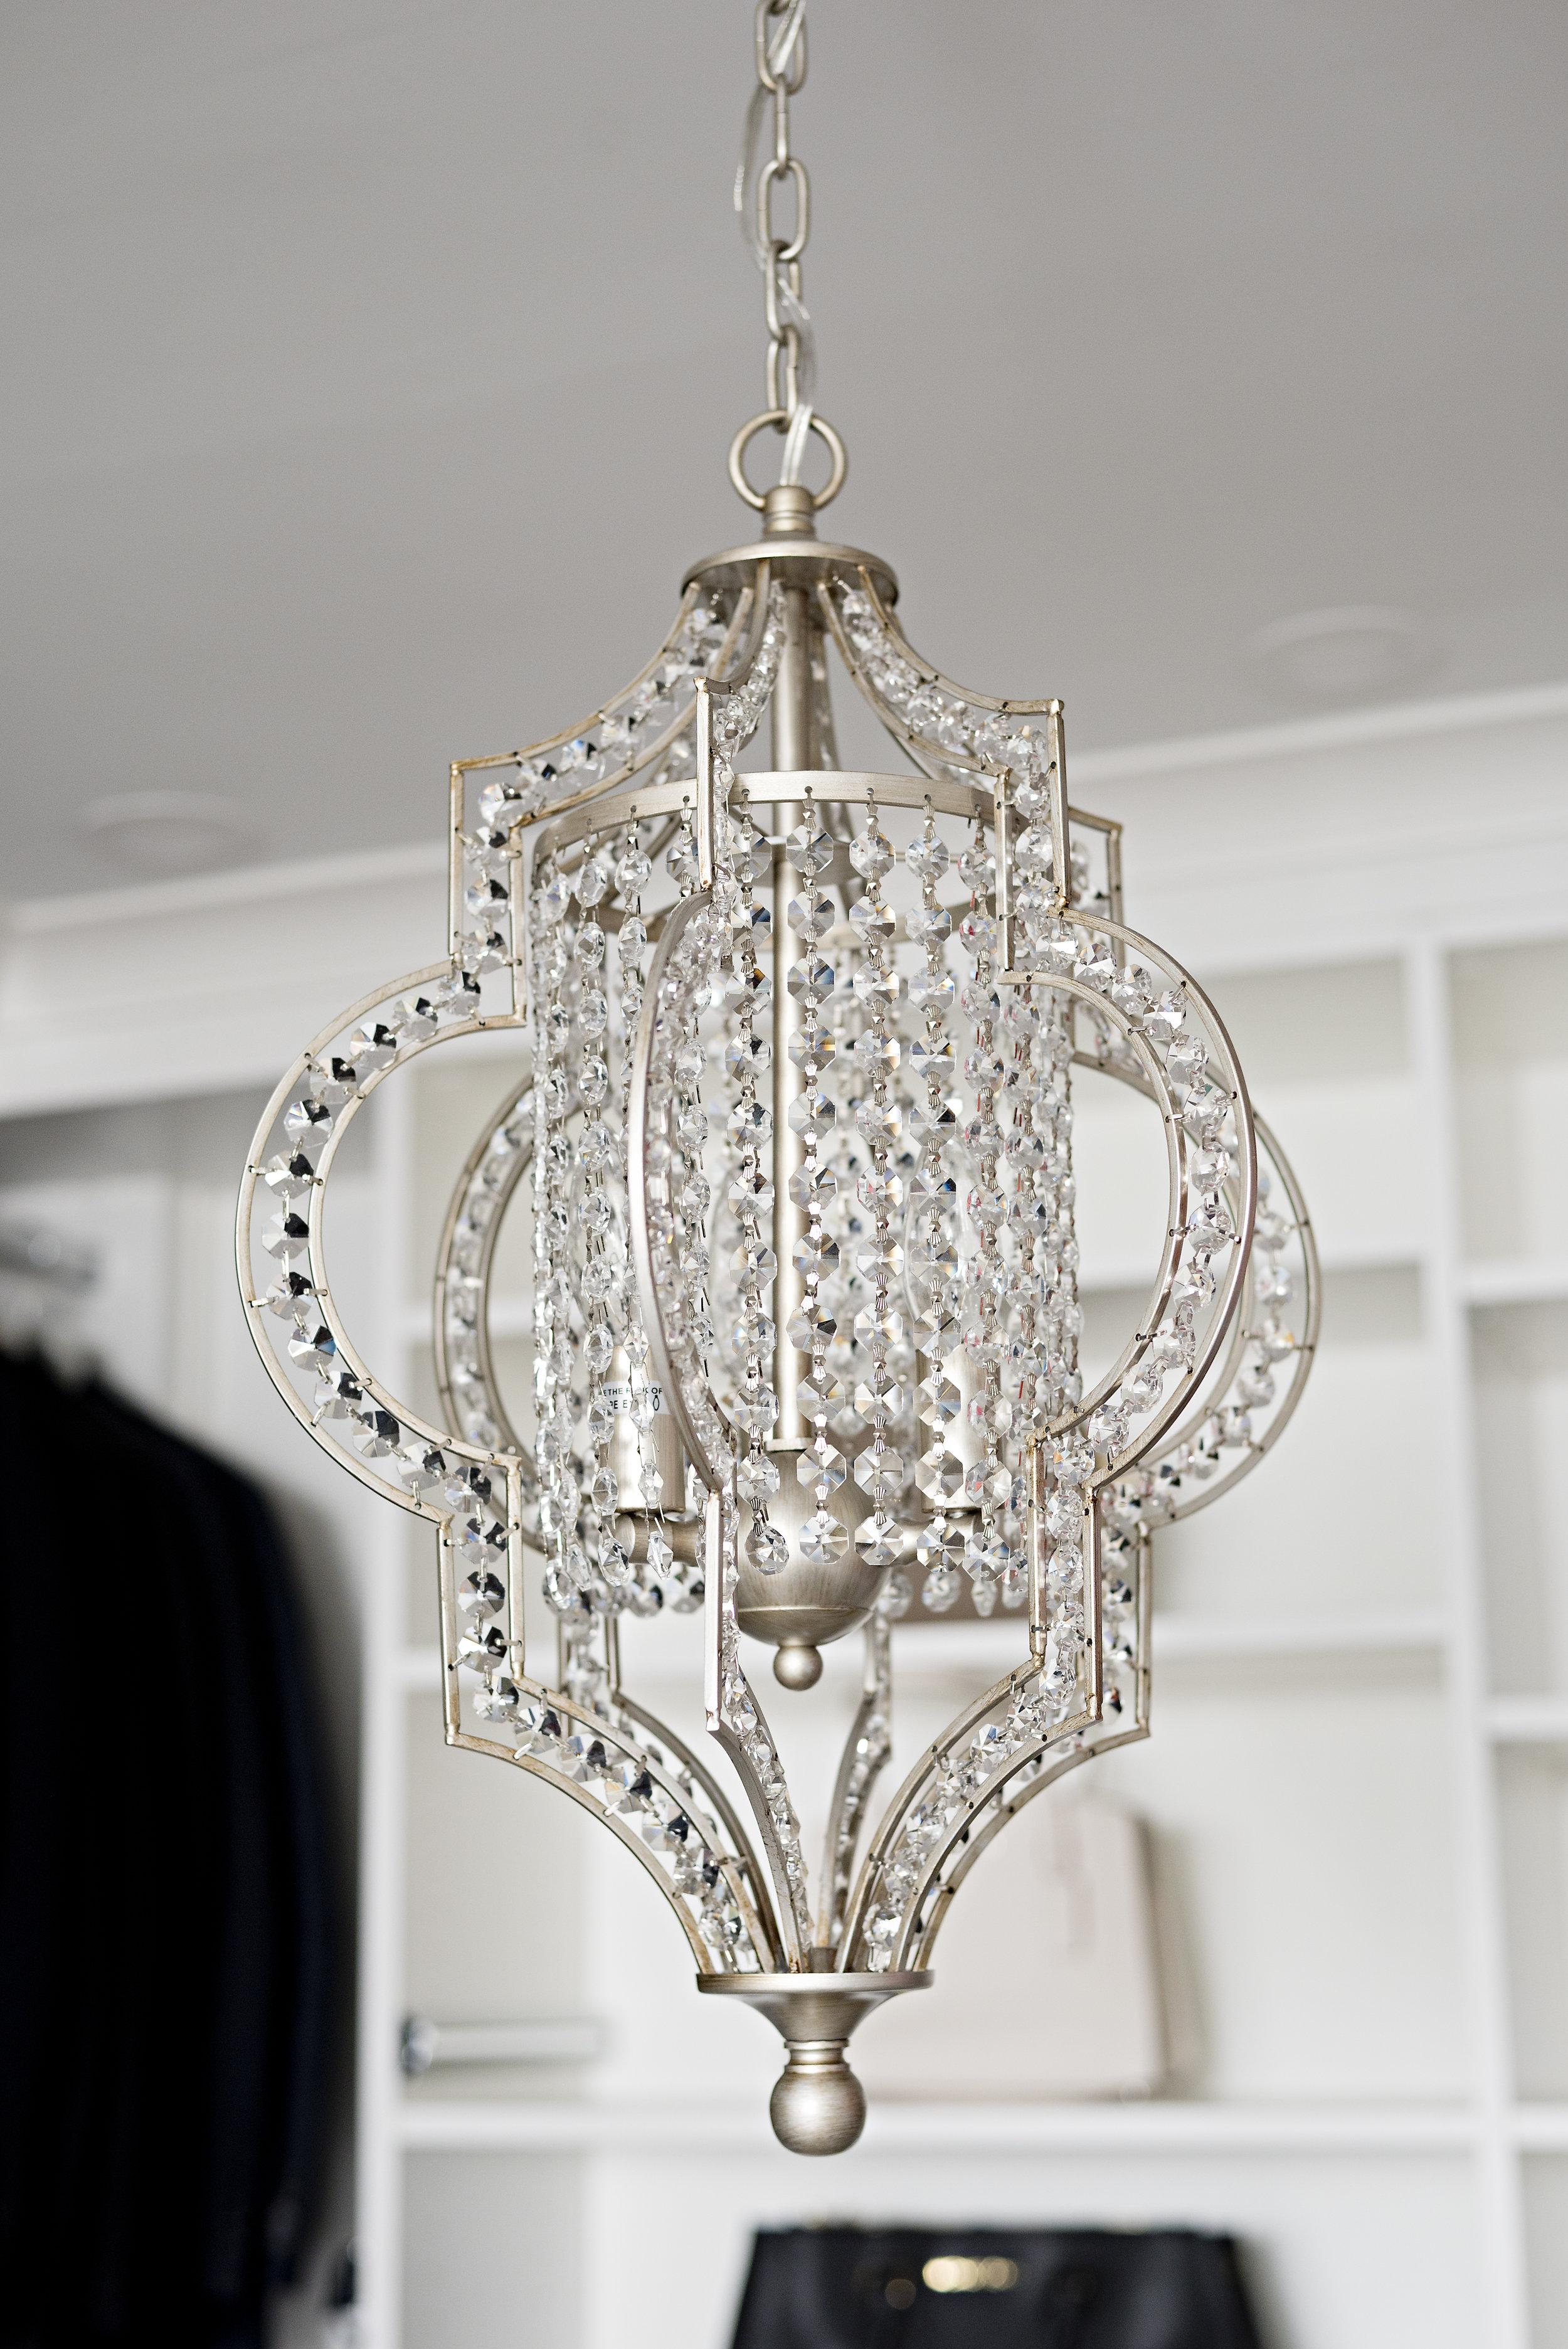 mini crystal chandelier satin nickel finish chain link moroccan inspired design style.jpg